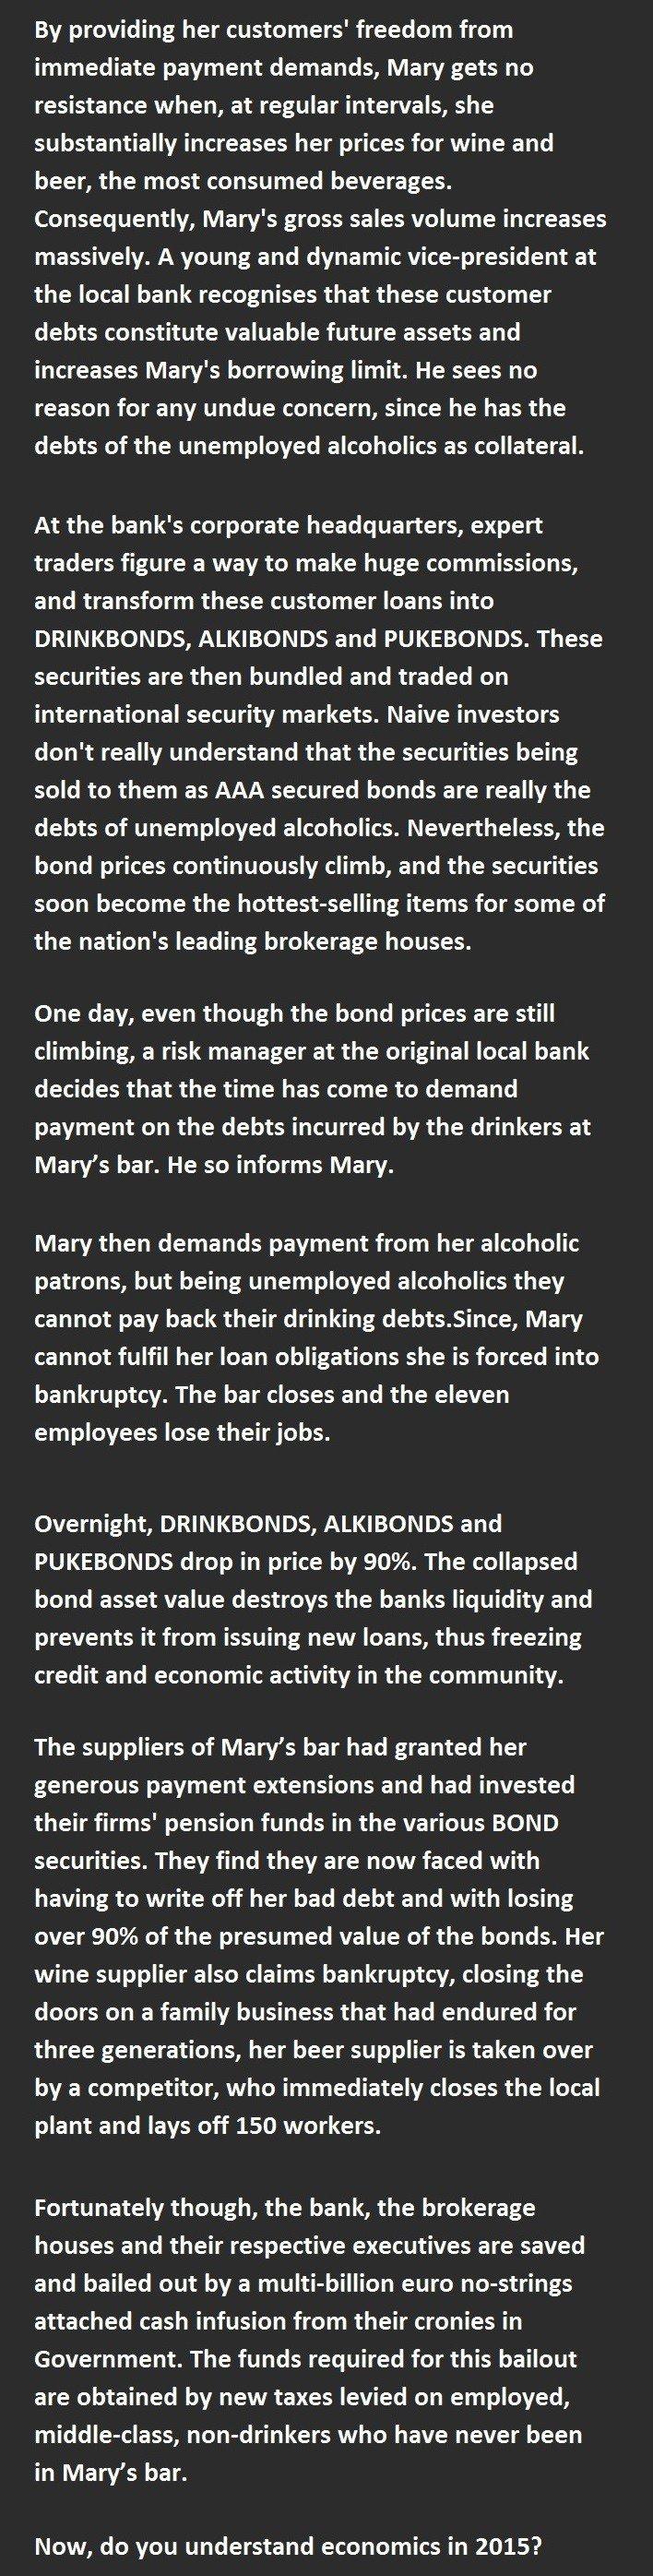 Dublin bar part 2